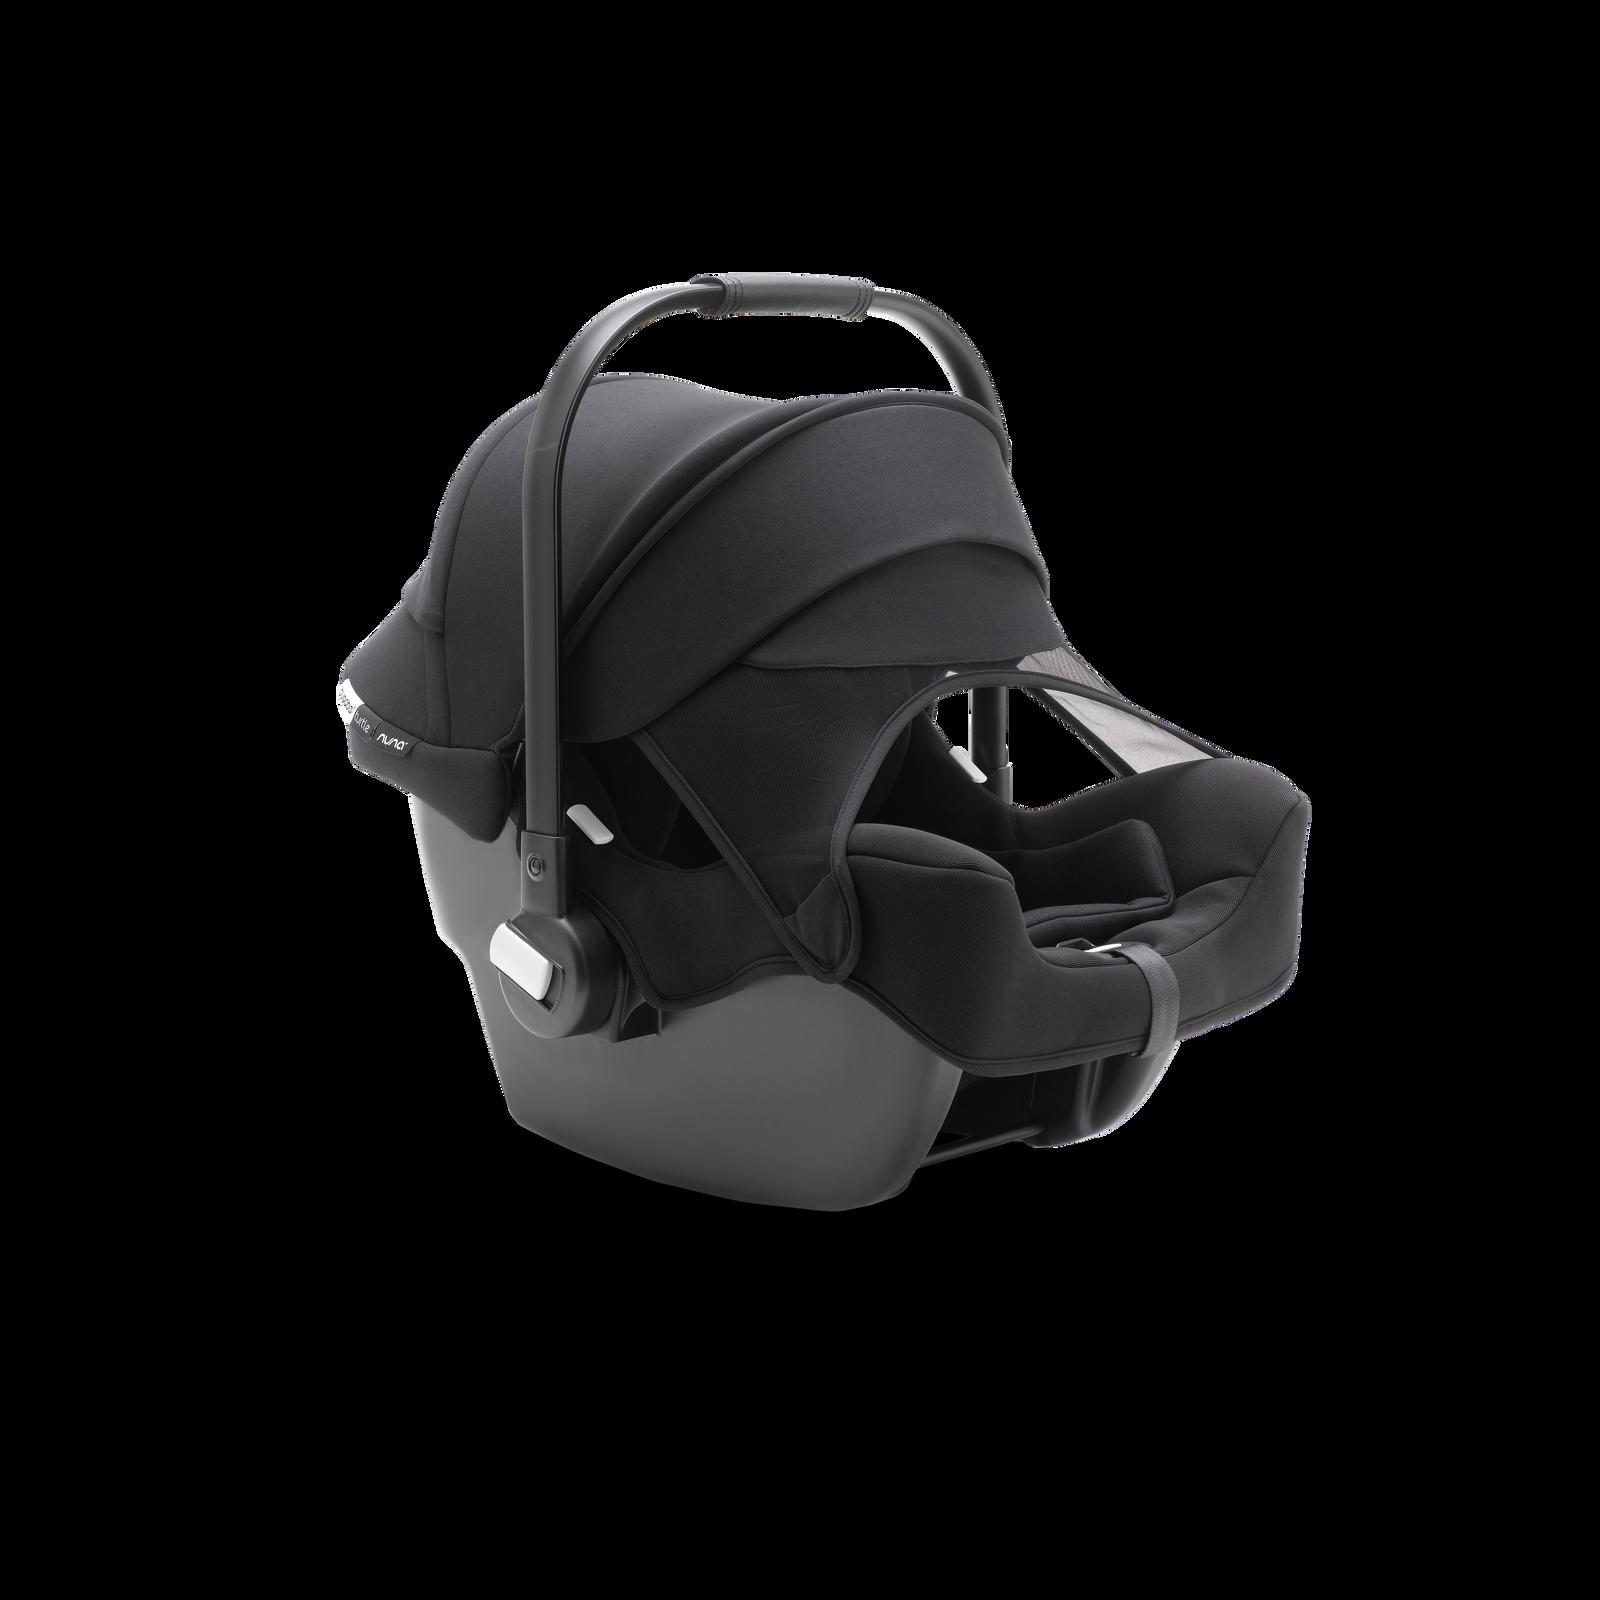 Bugaboo Turtle by Nuna baby capsule with Isofix base